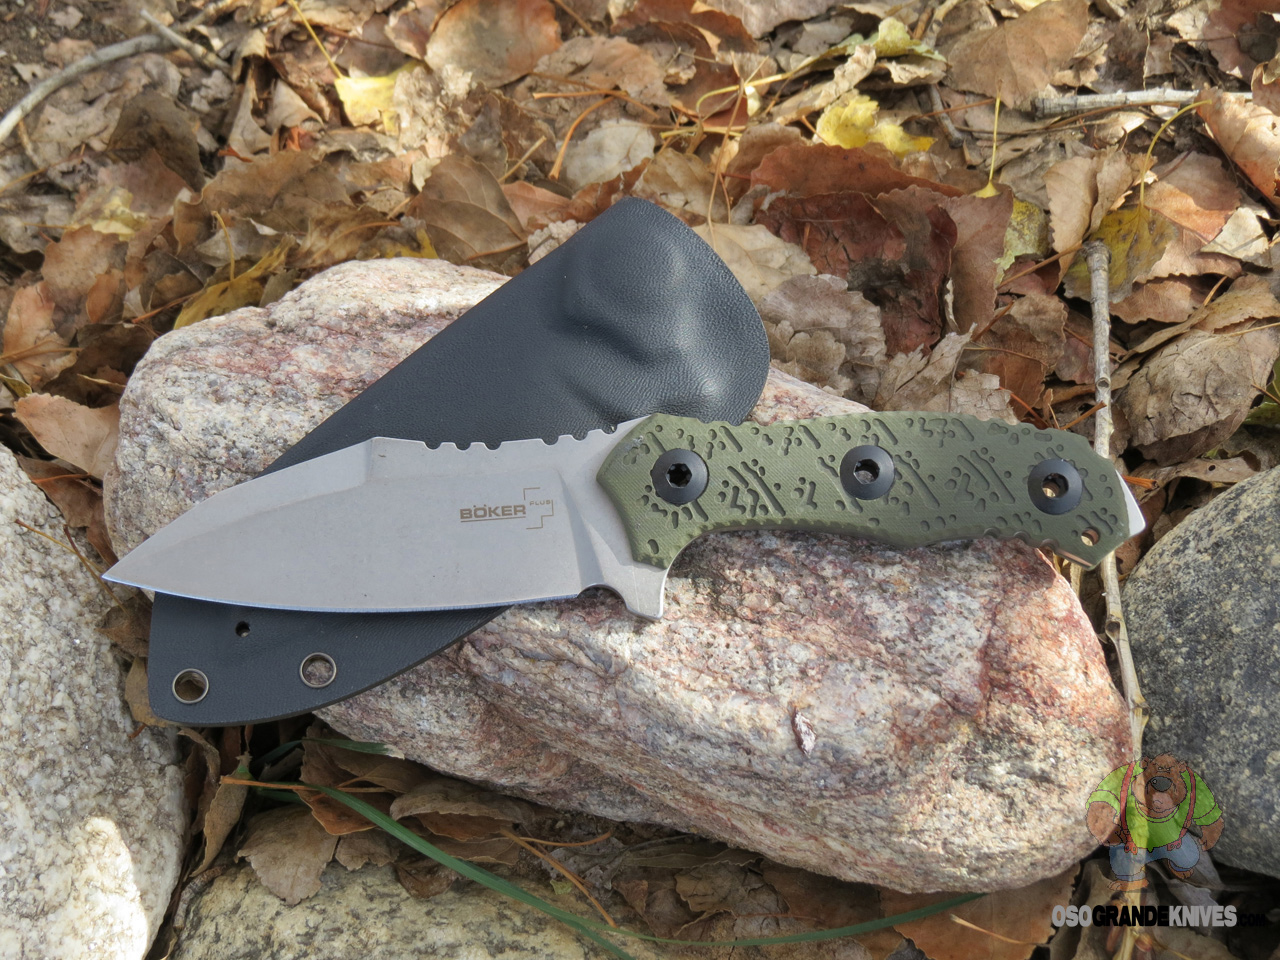 Gifts For Organizers >> Boker Plus Colubris Fixed Blade Knife Stonewash Blade 02BO055 | OsoGrandeKnives